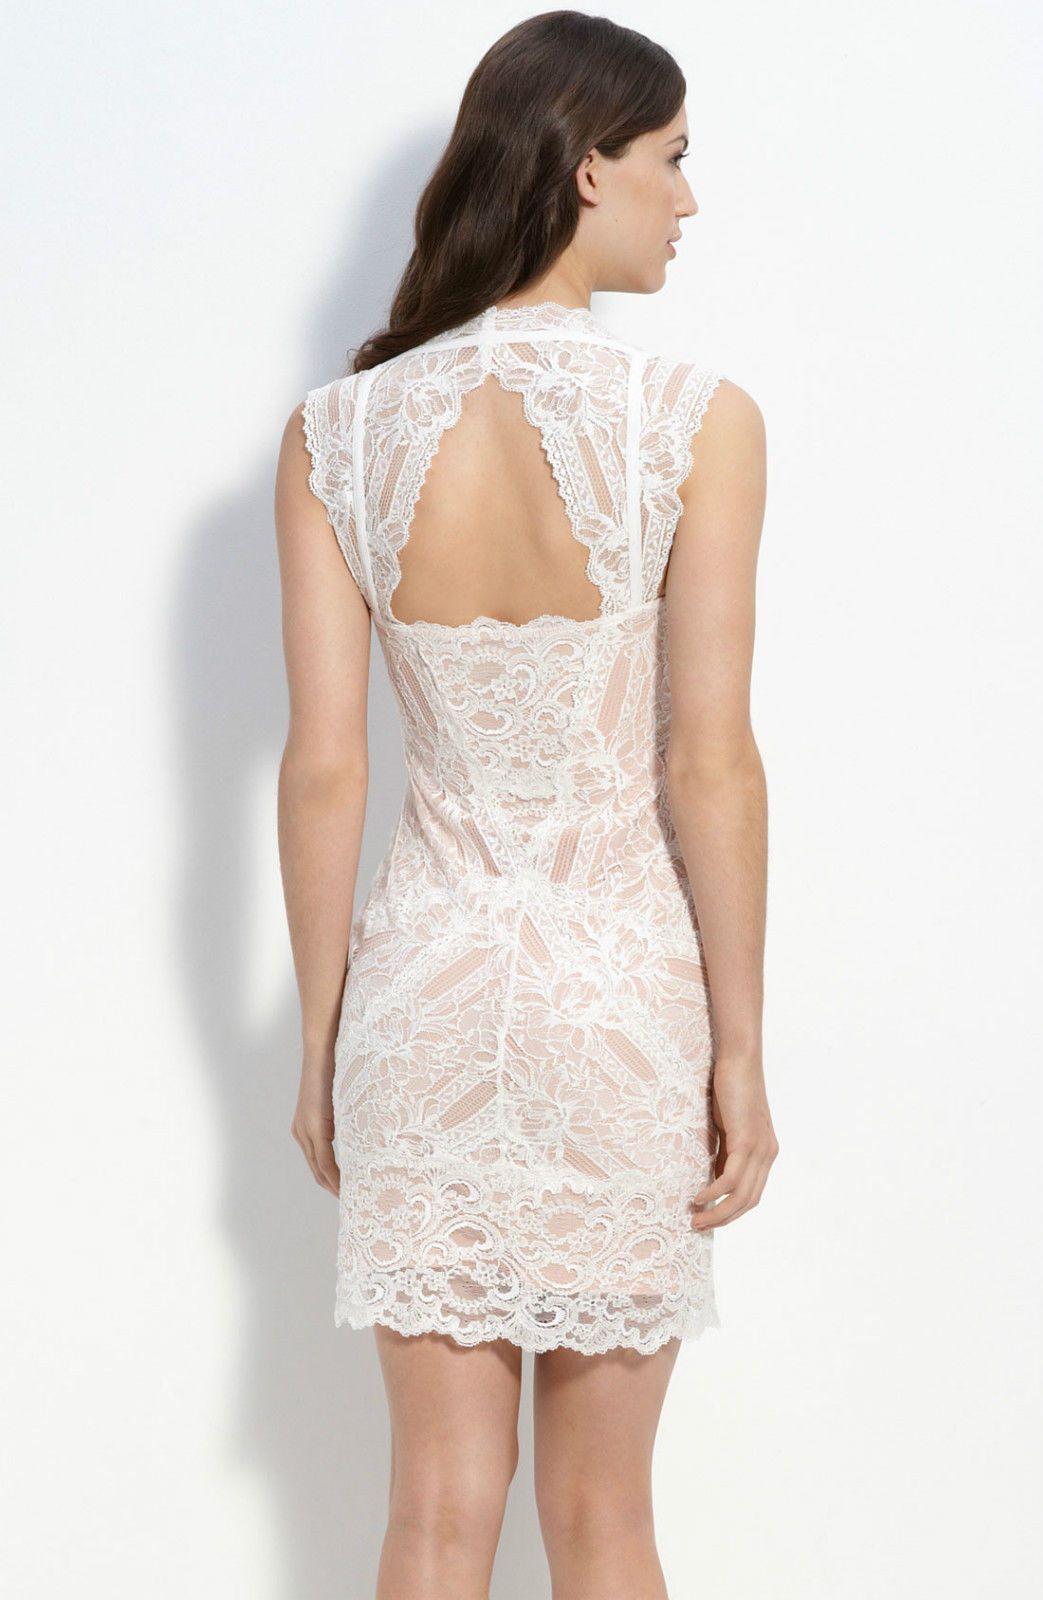 NICOLE MILLER ~ Ivory Lace Cutout Back Sheath Cocktail Dress P NEW $430